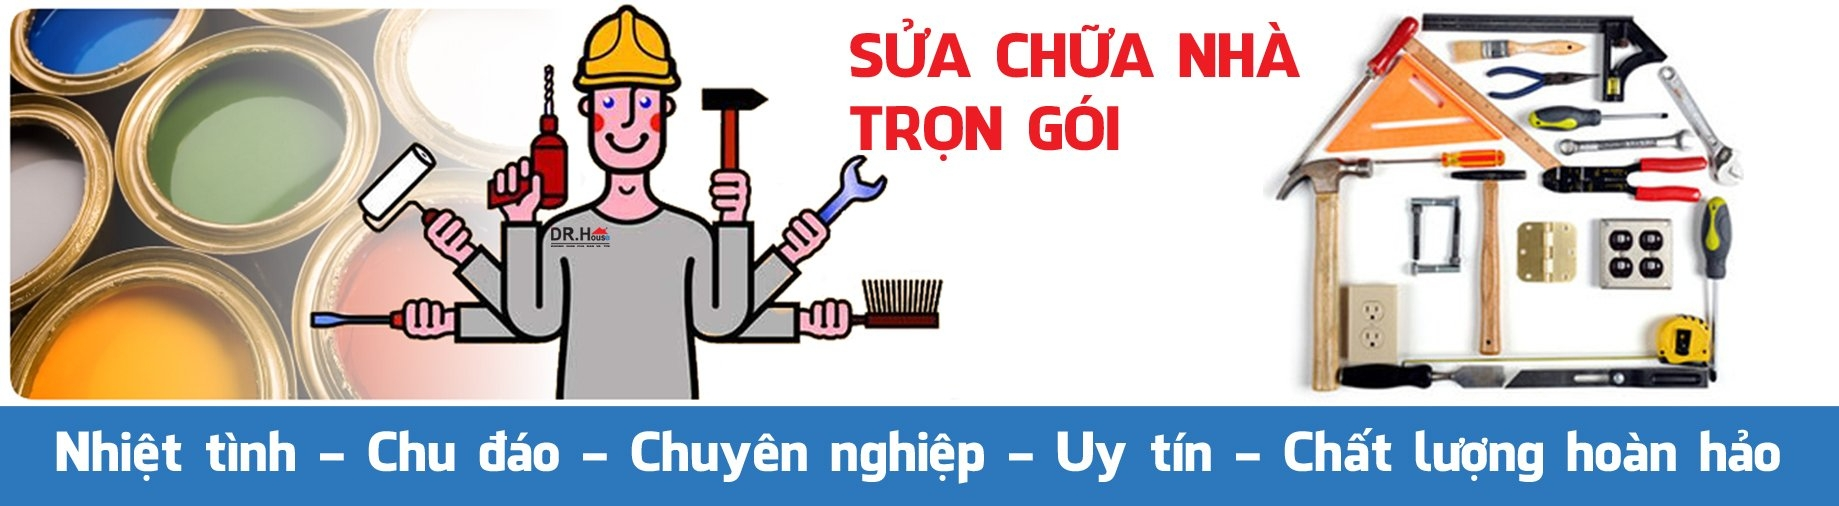 thongcaucong  (@thongcauconghp) Cover Image